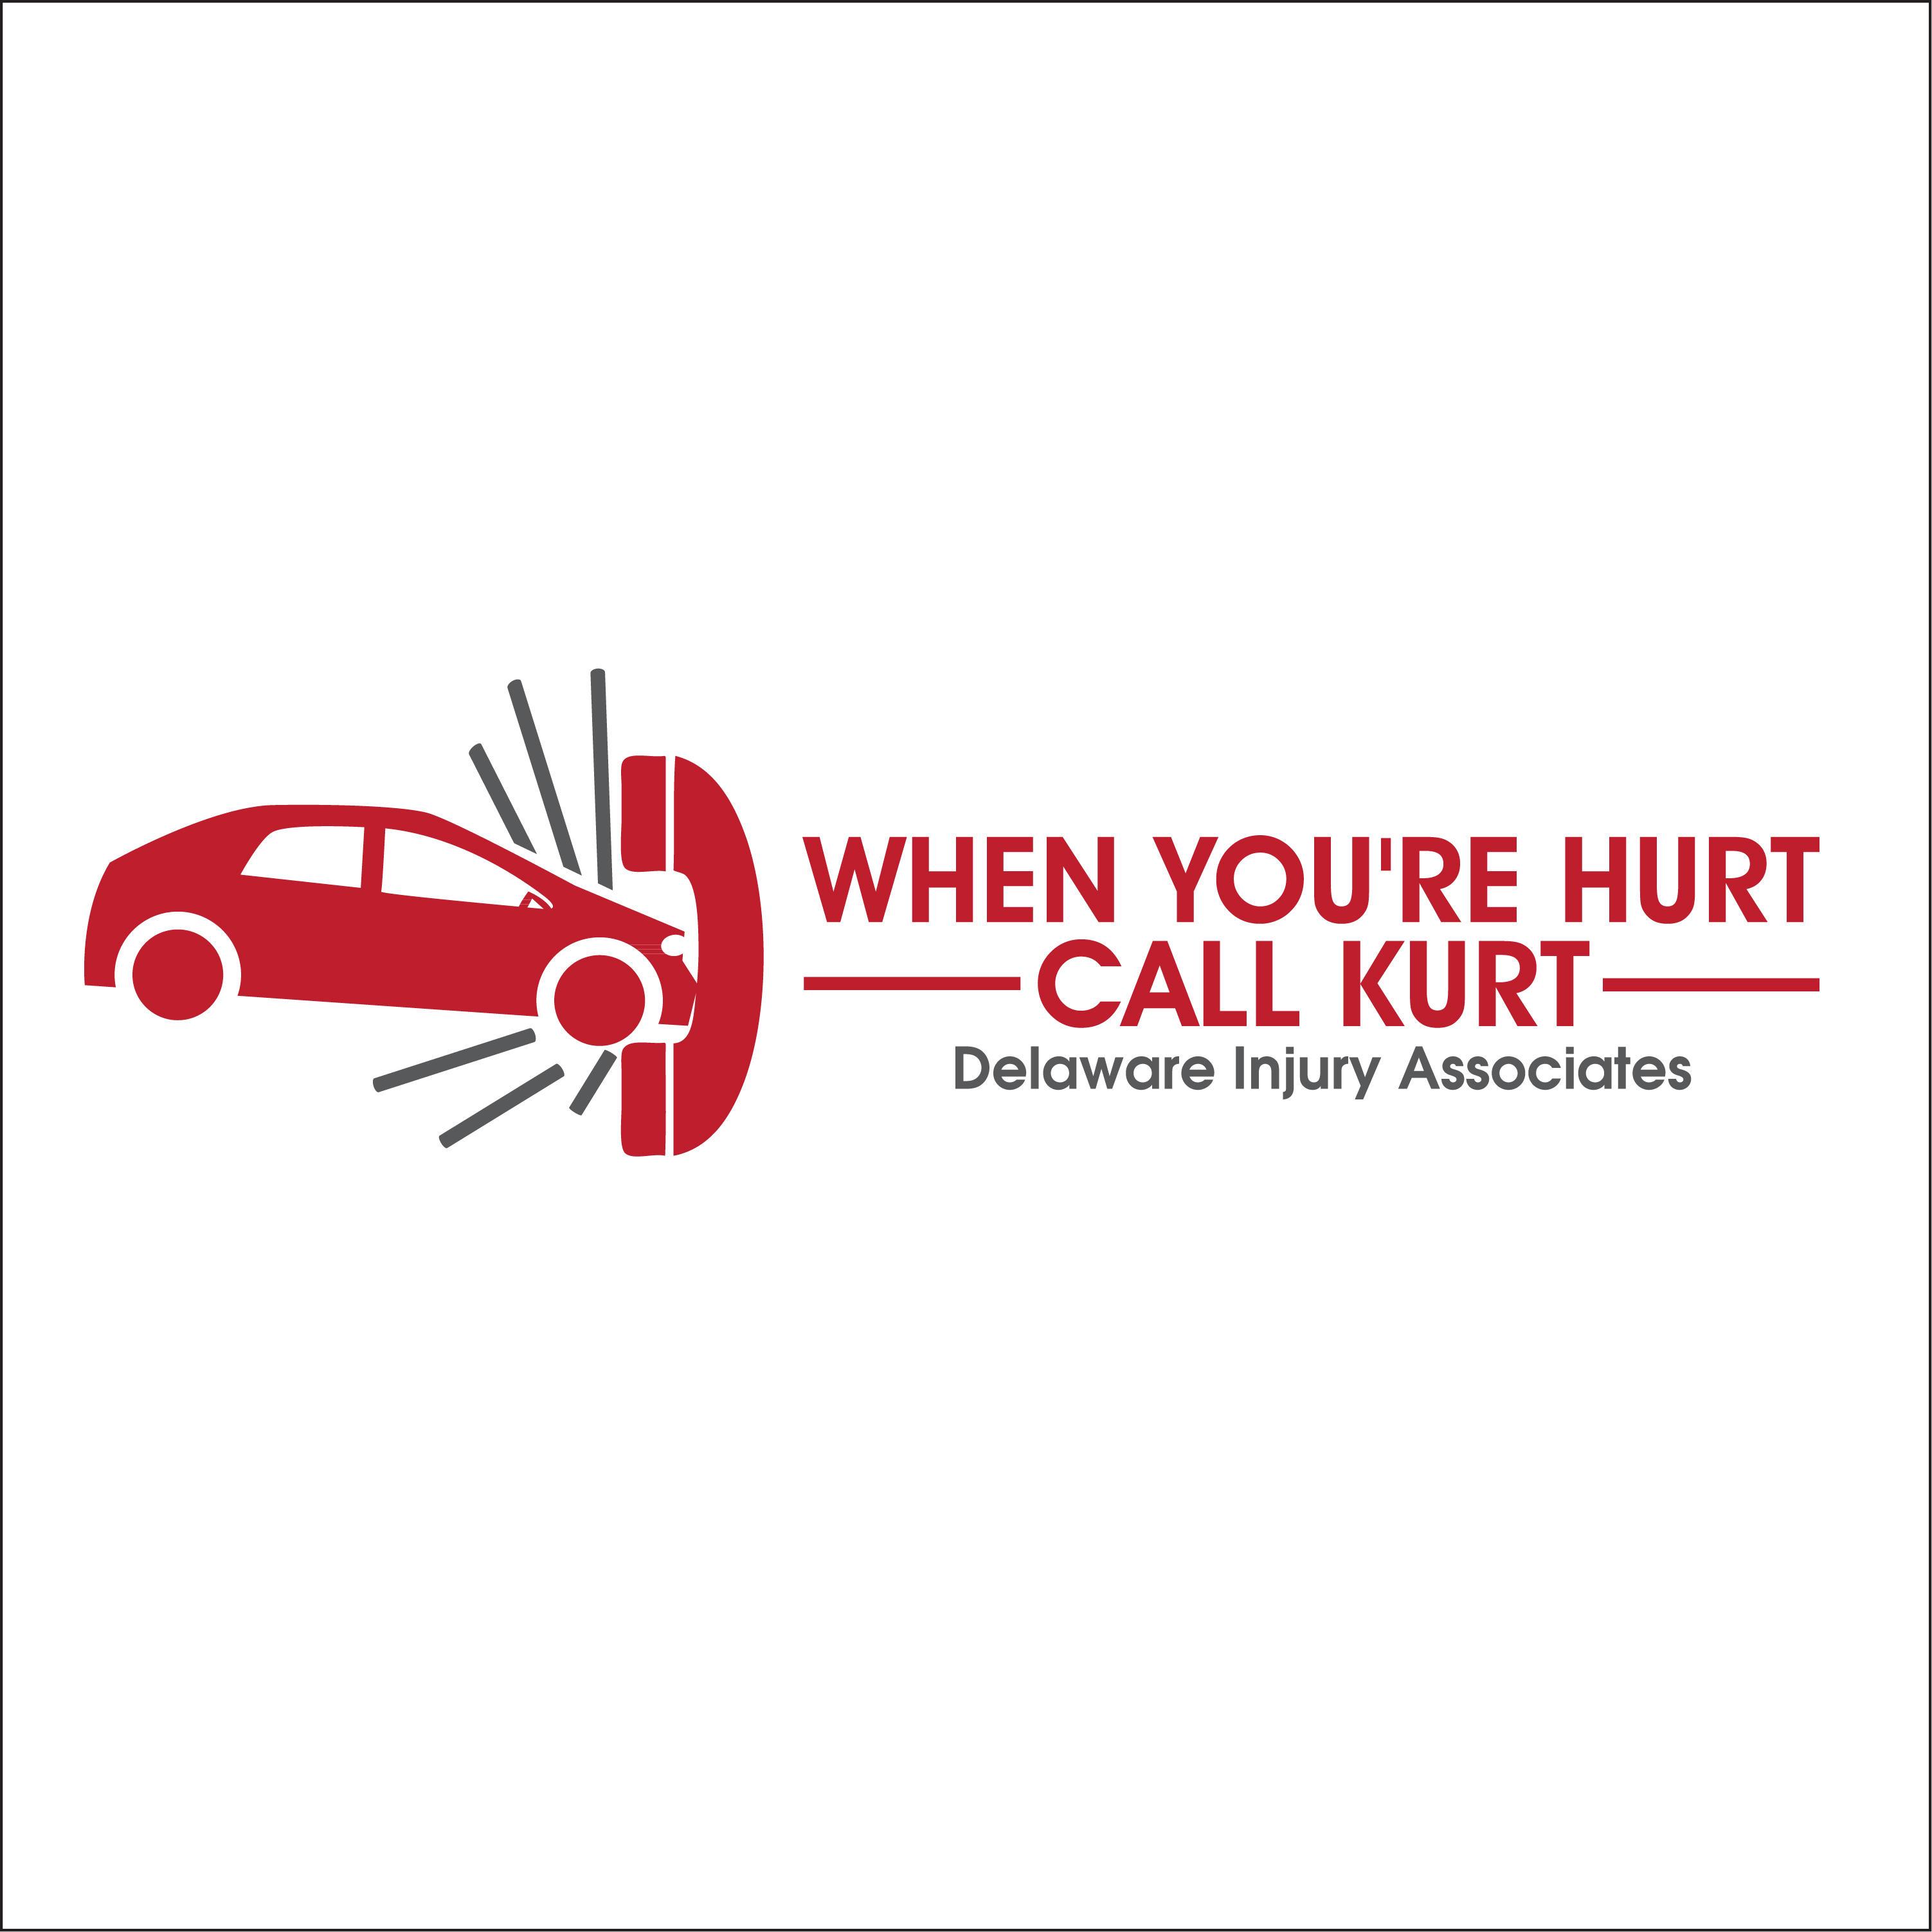 Delaware Injury Associates  When You're Hurt Call Kurt